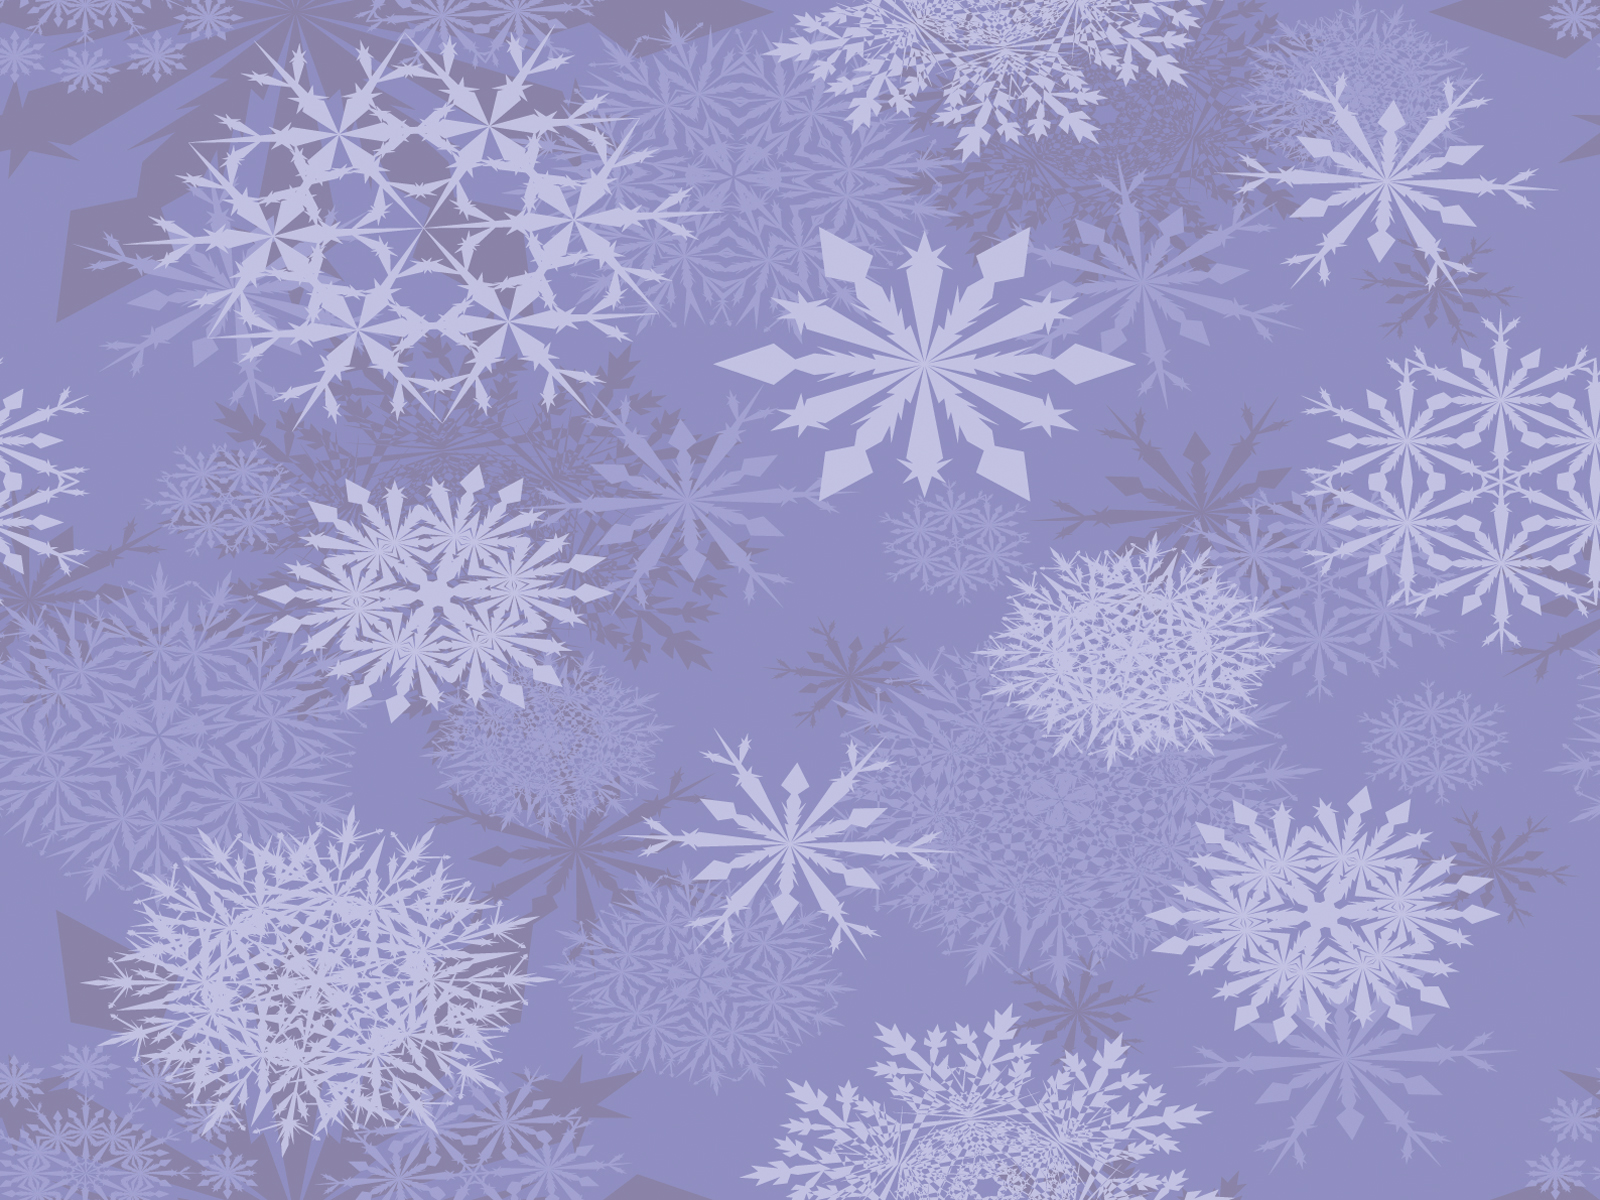 Light Purple Snowflakes Backgrounds